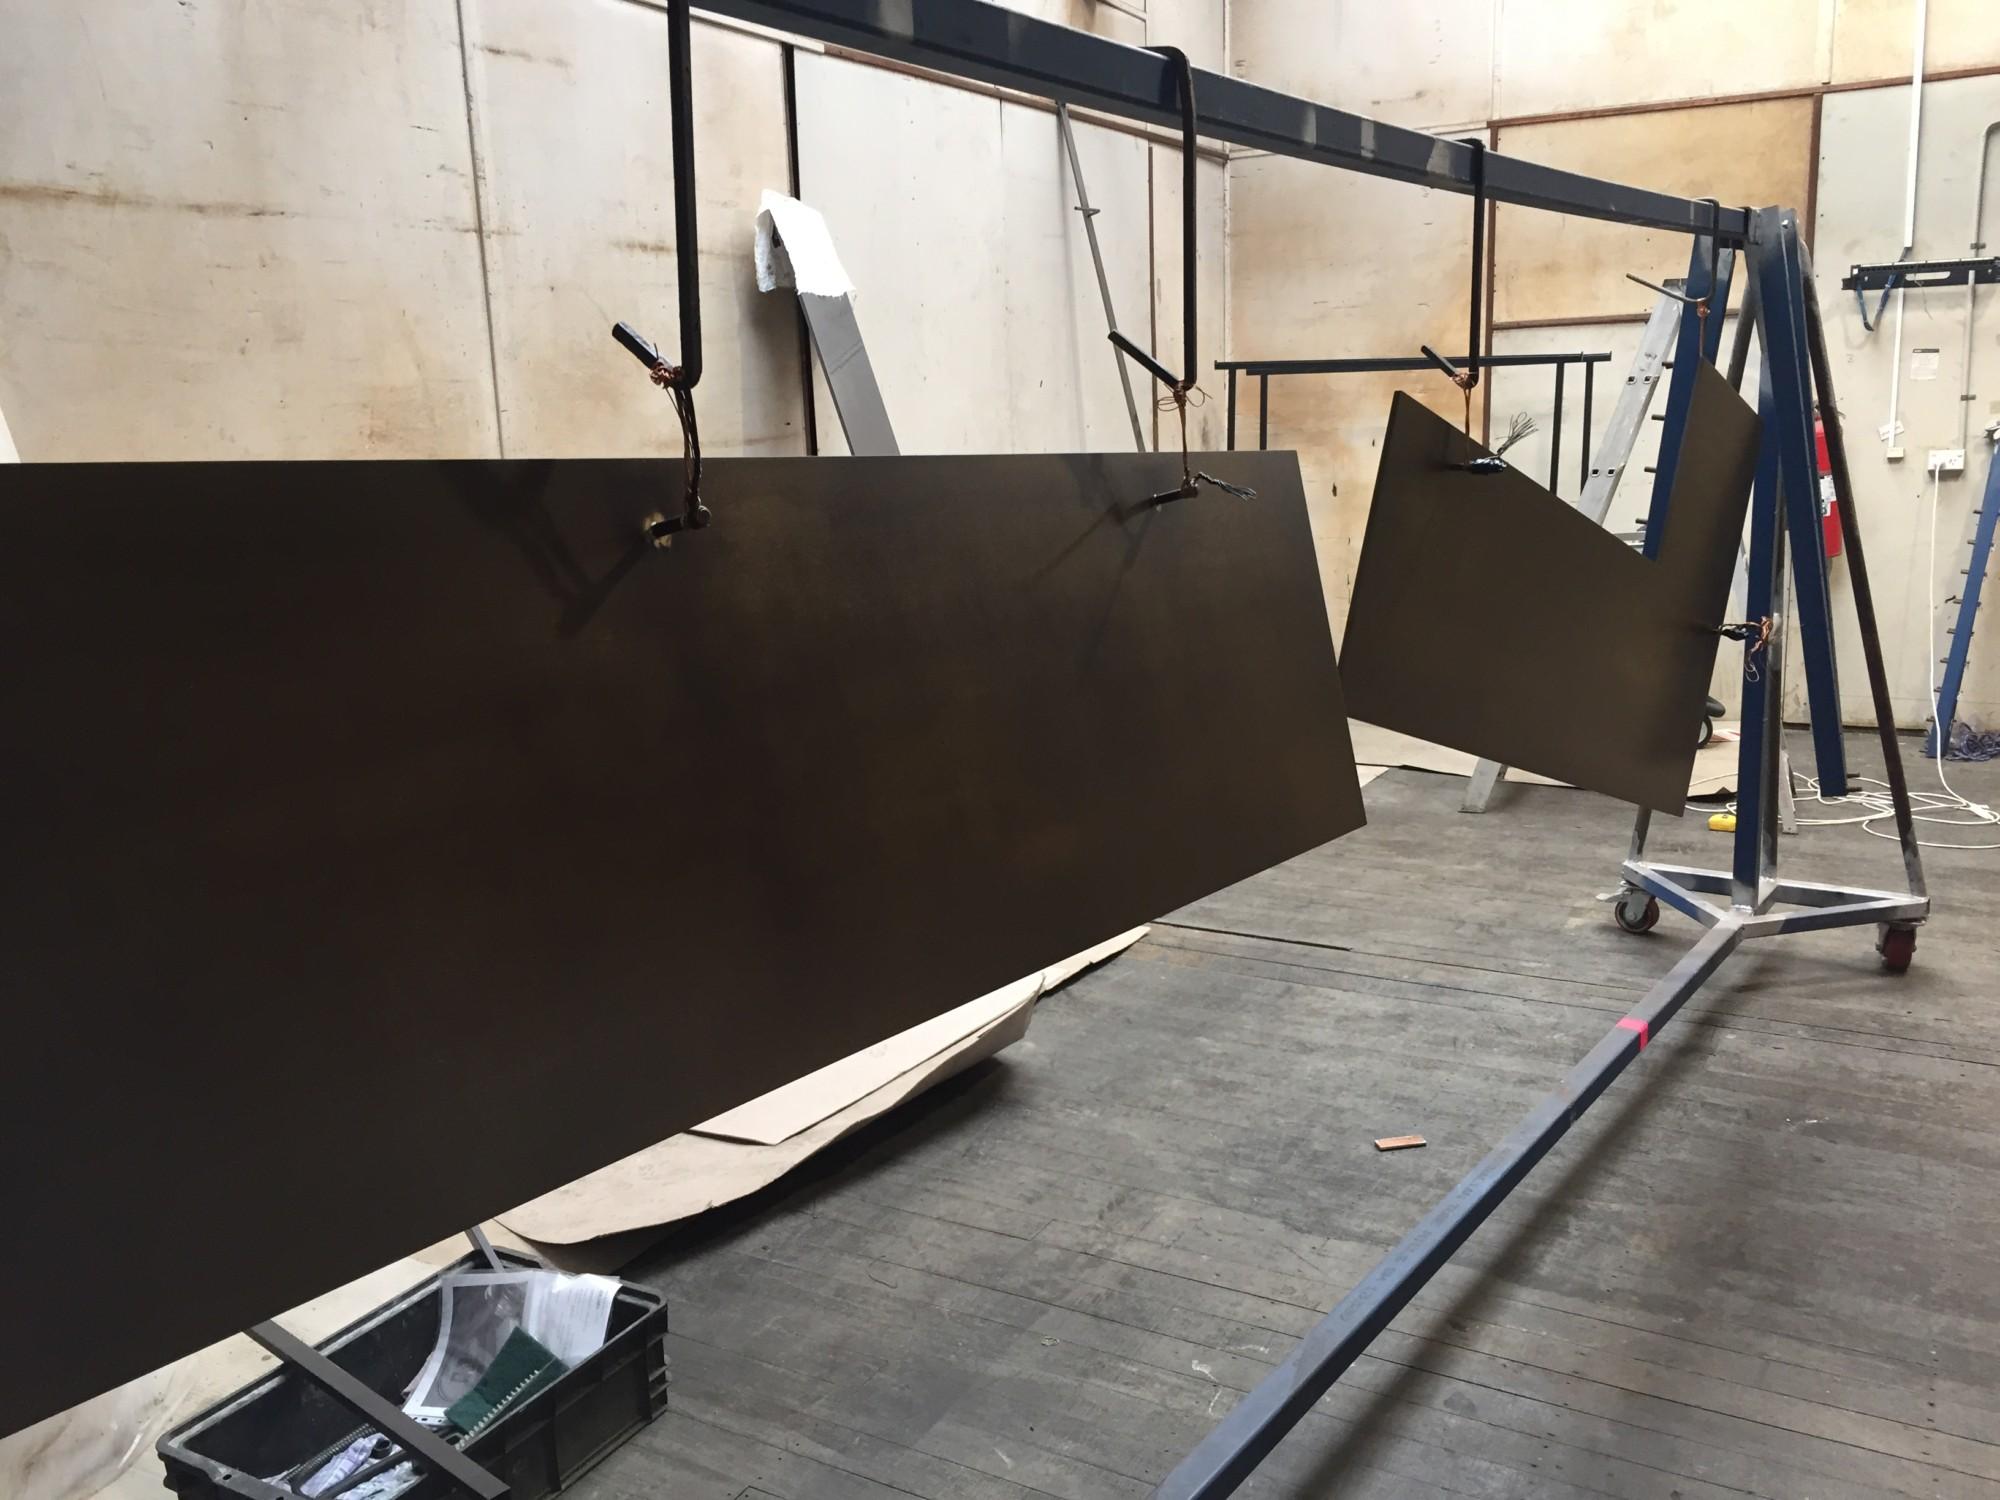 Procyon Satin Pearl Black Nickel to 8mm aluminium panels